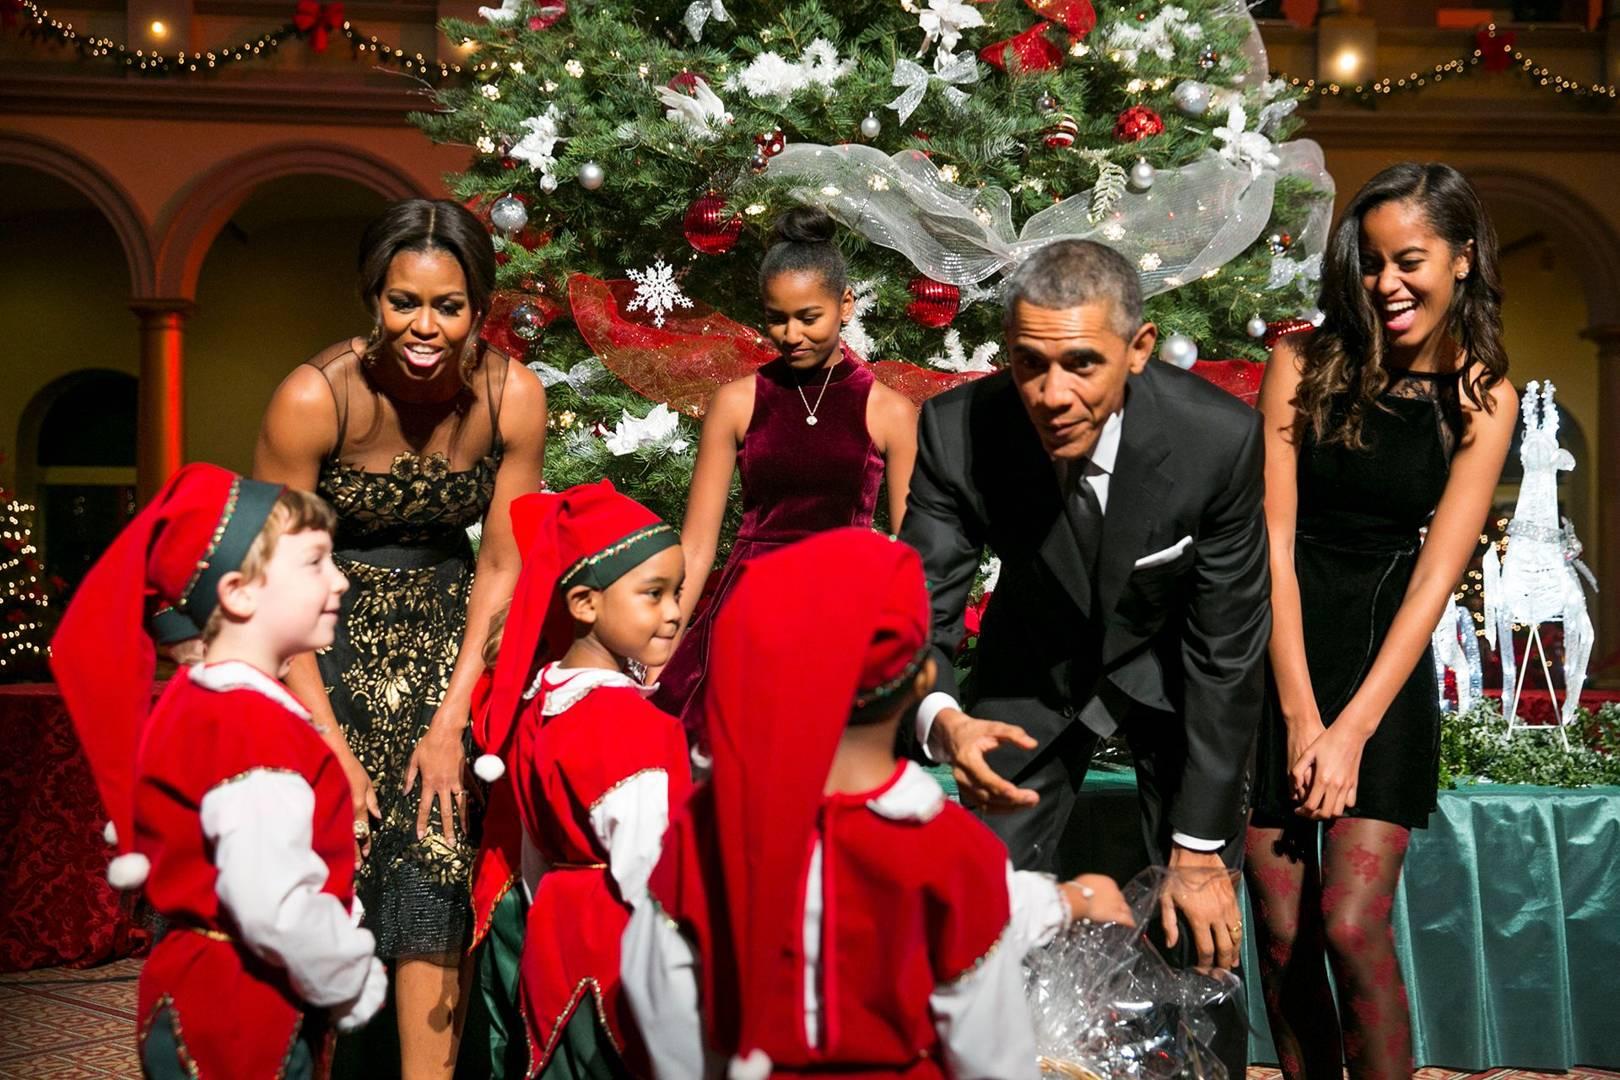 Barack Obama United States of America President Quotes   British Vogue